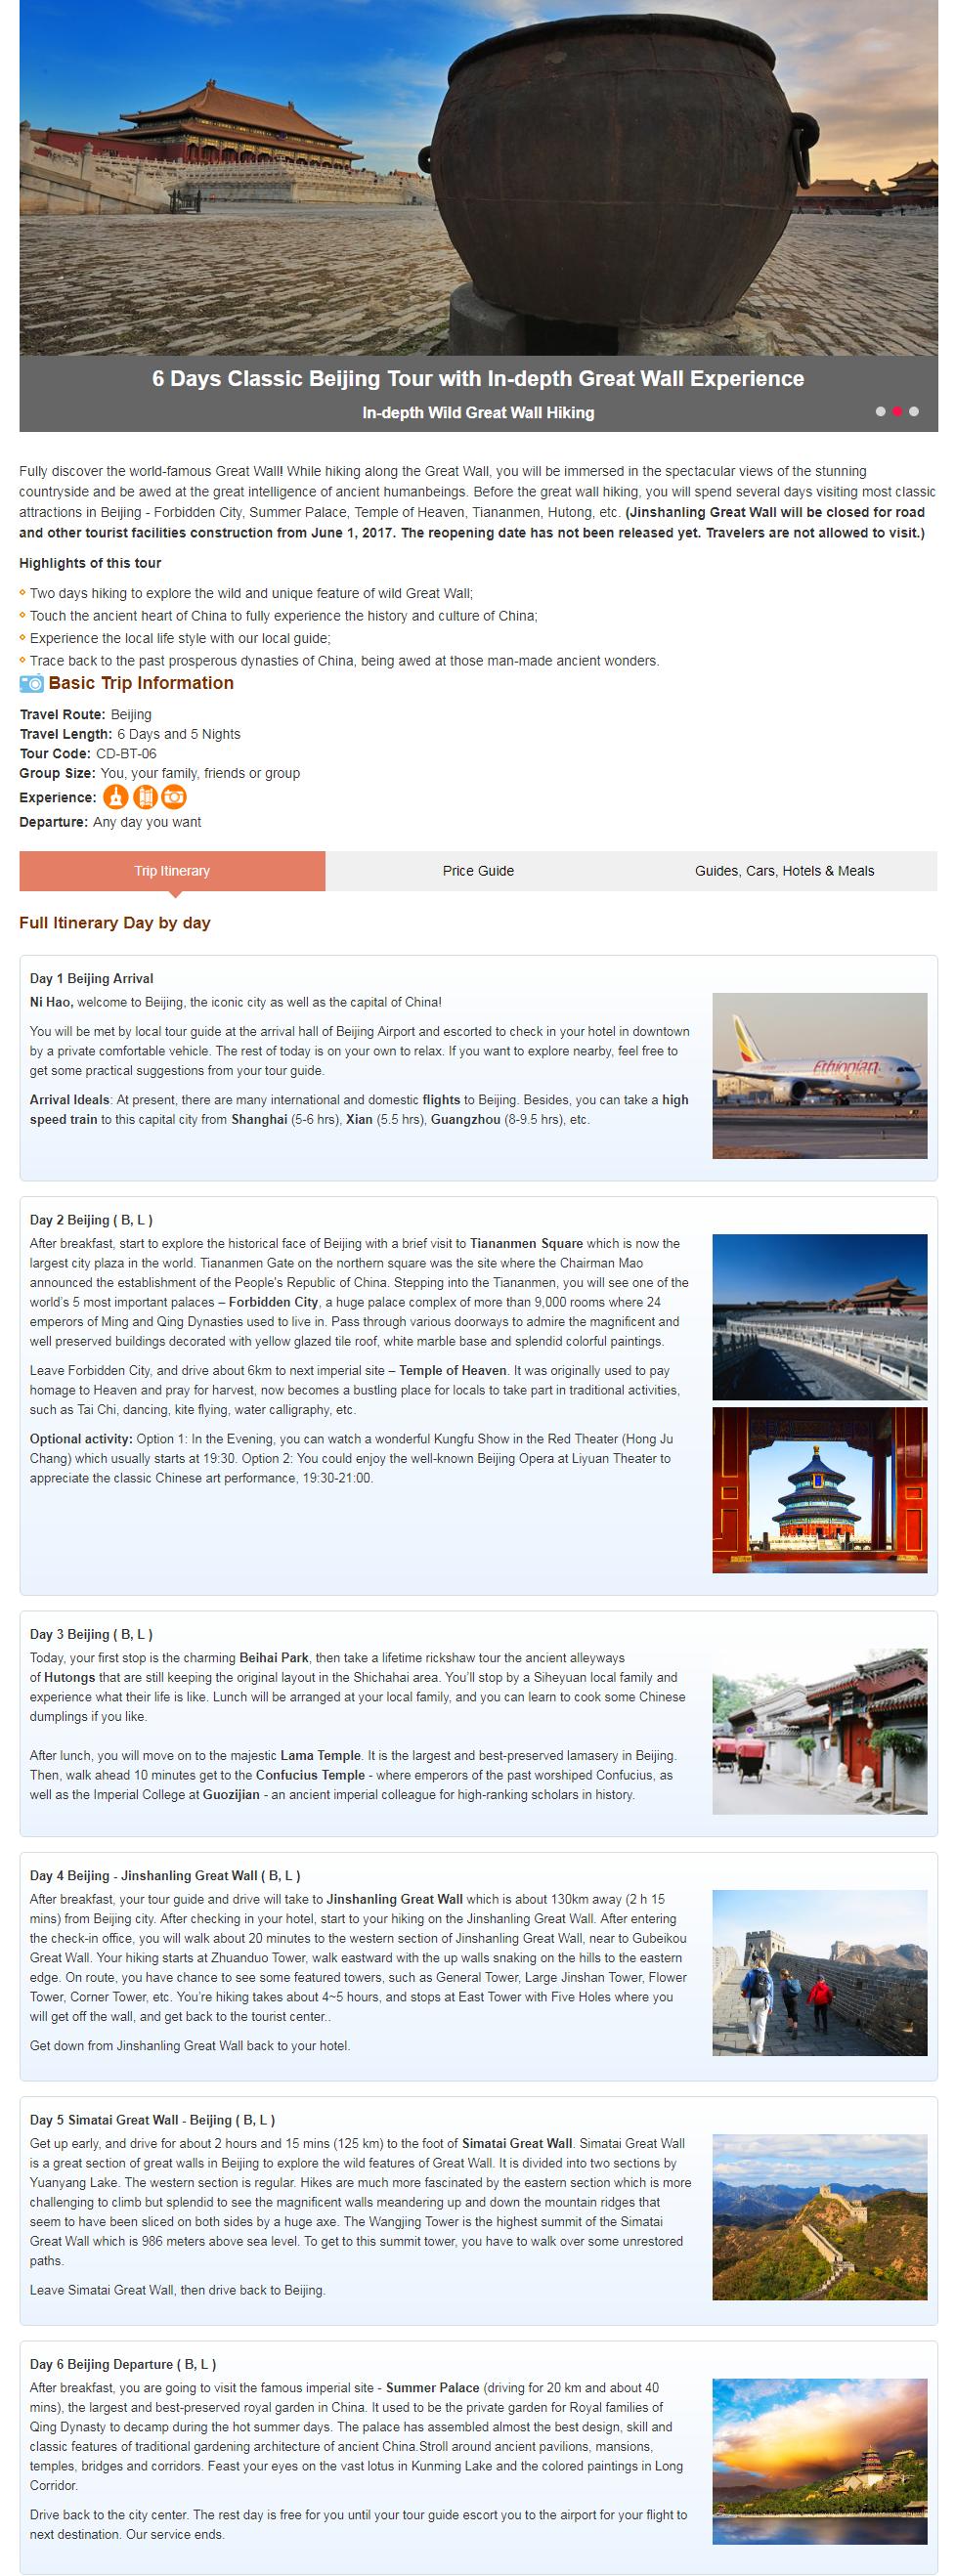 Opera Snapshot_2017-12-13_071339_www.chinadiscovery.com